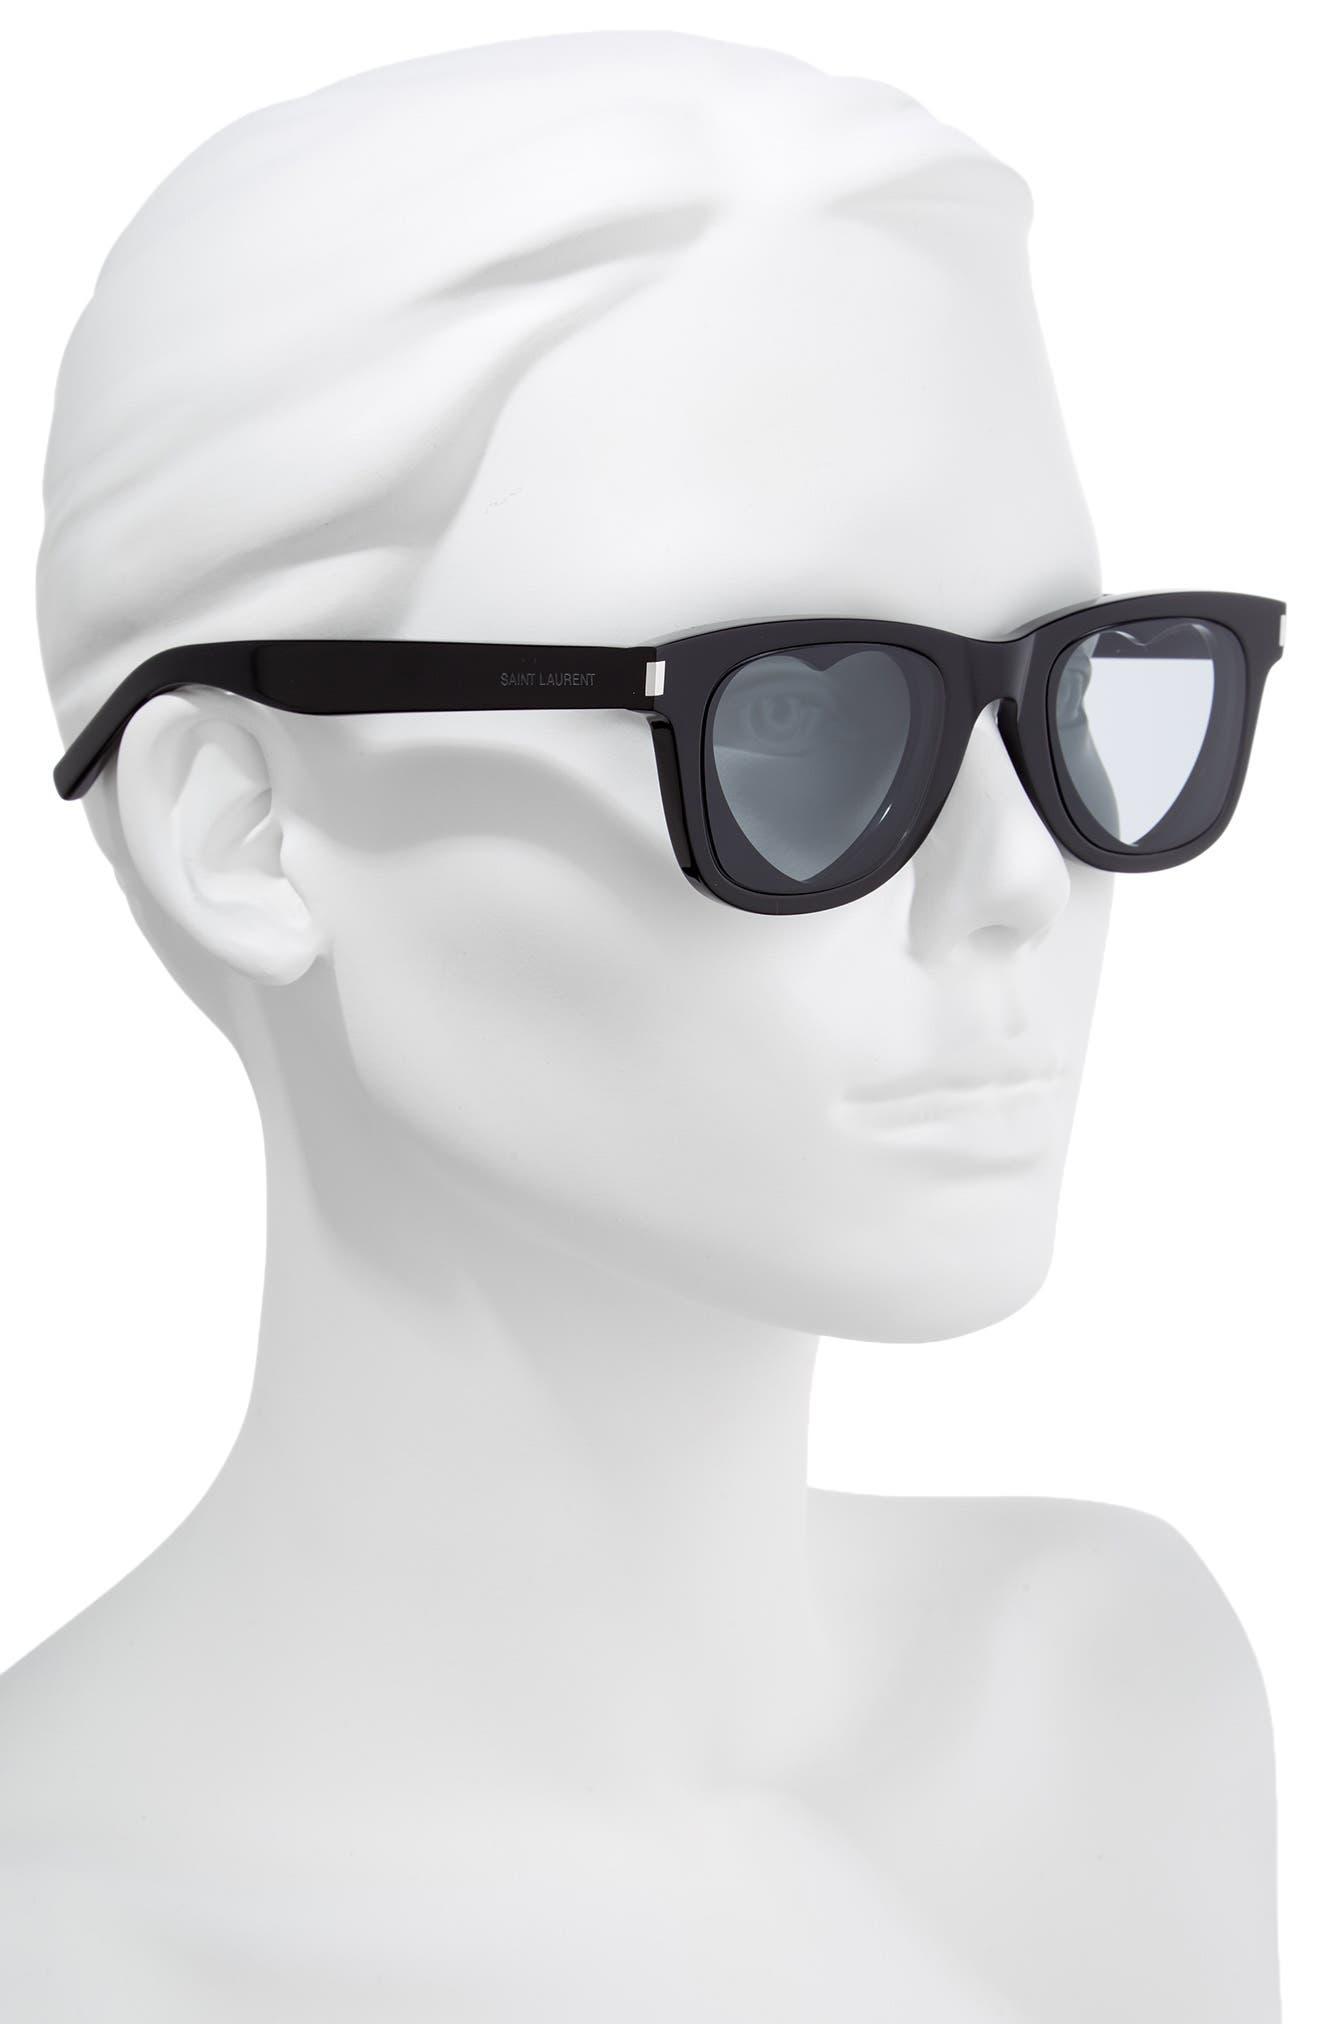 50mm Heart Sunglasses,                             Alternate thumbnail 2, color,                             001